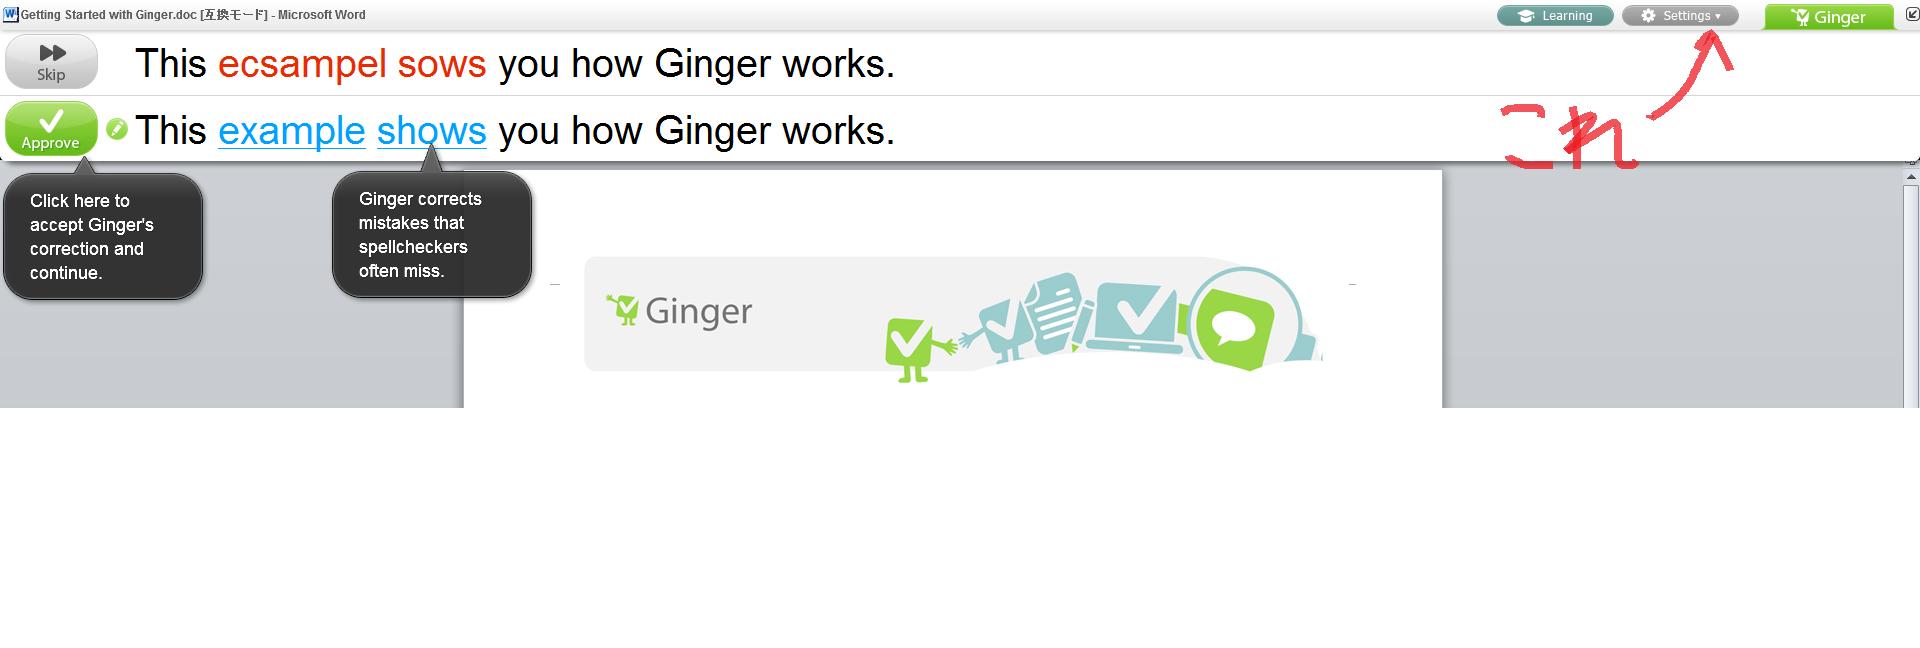 Ginger_F2_Settings.png